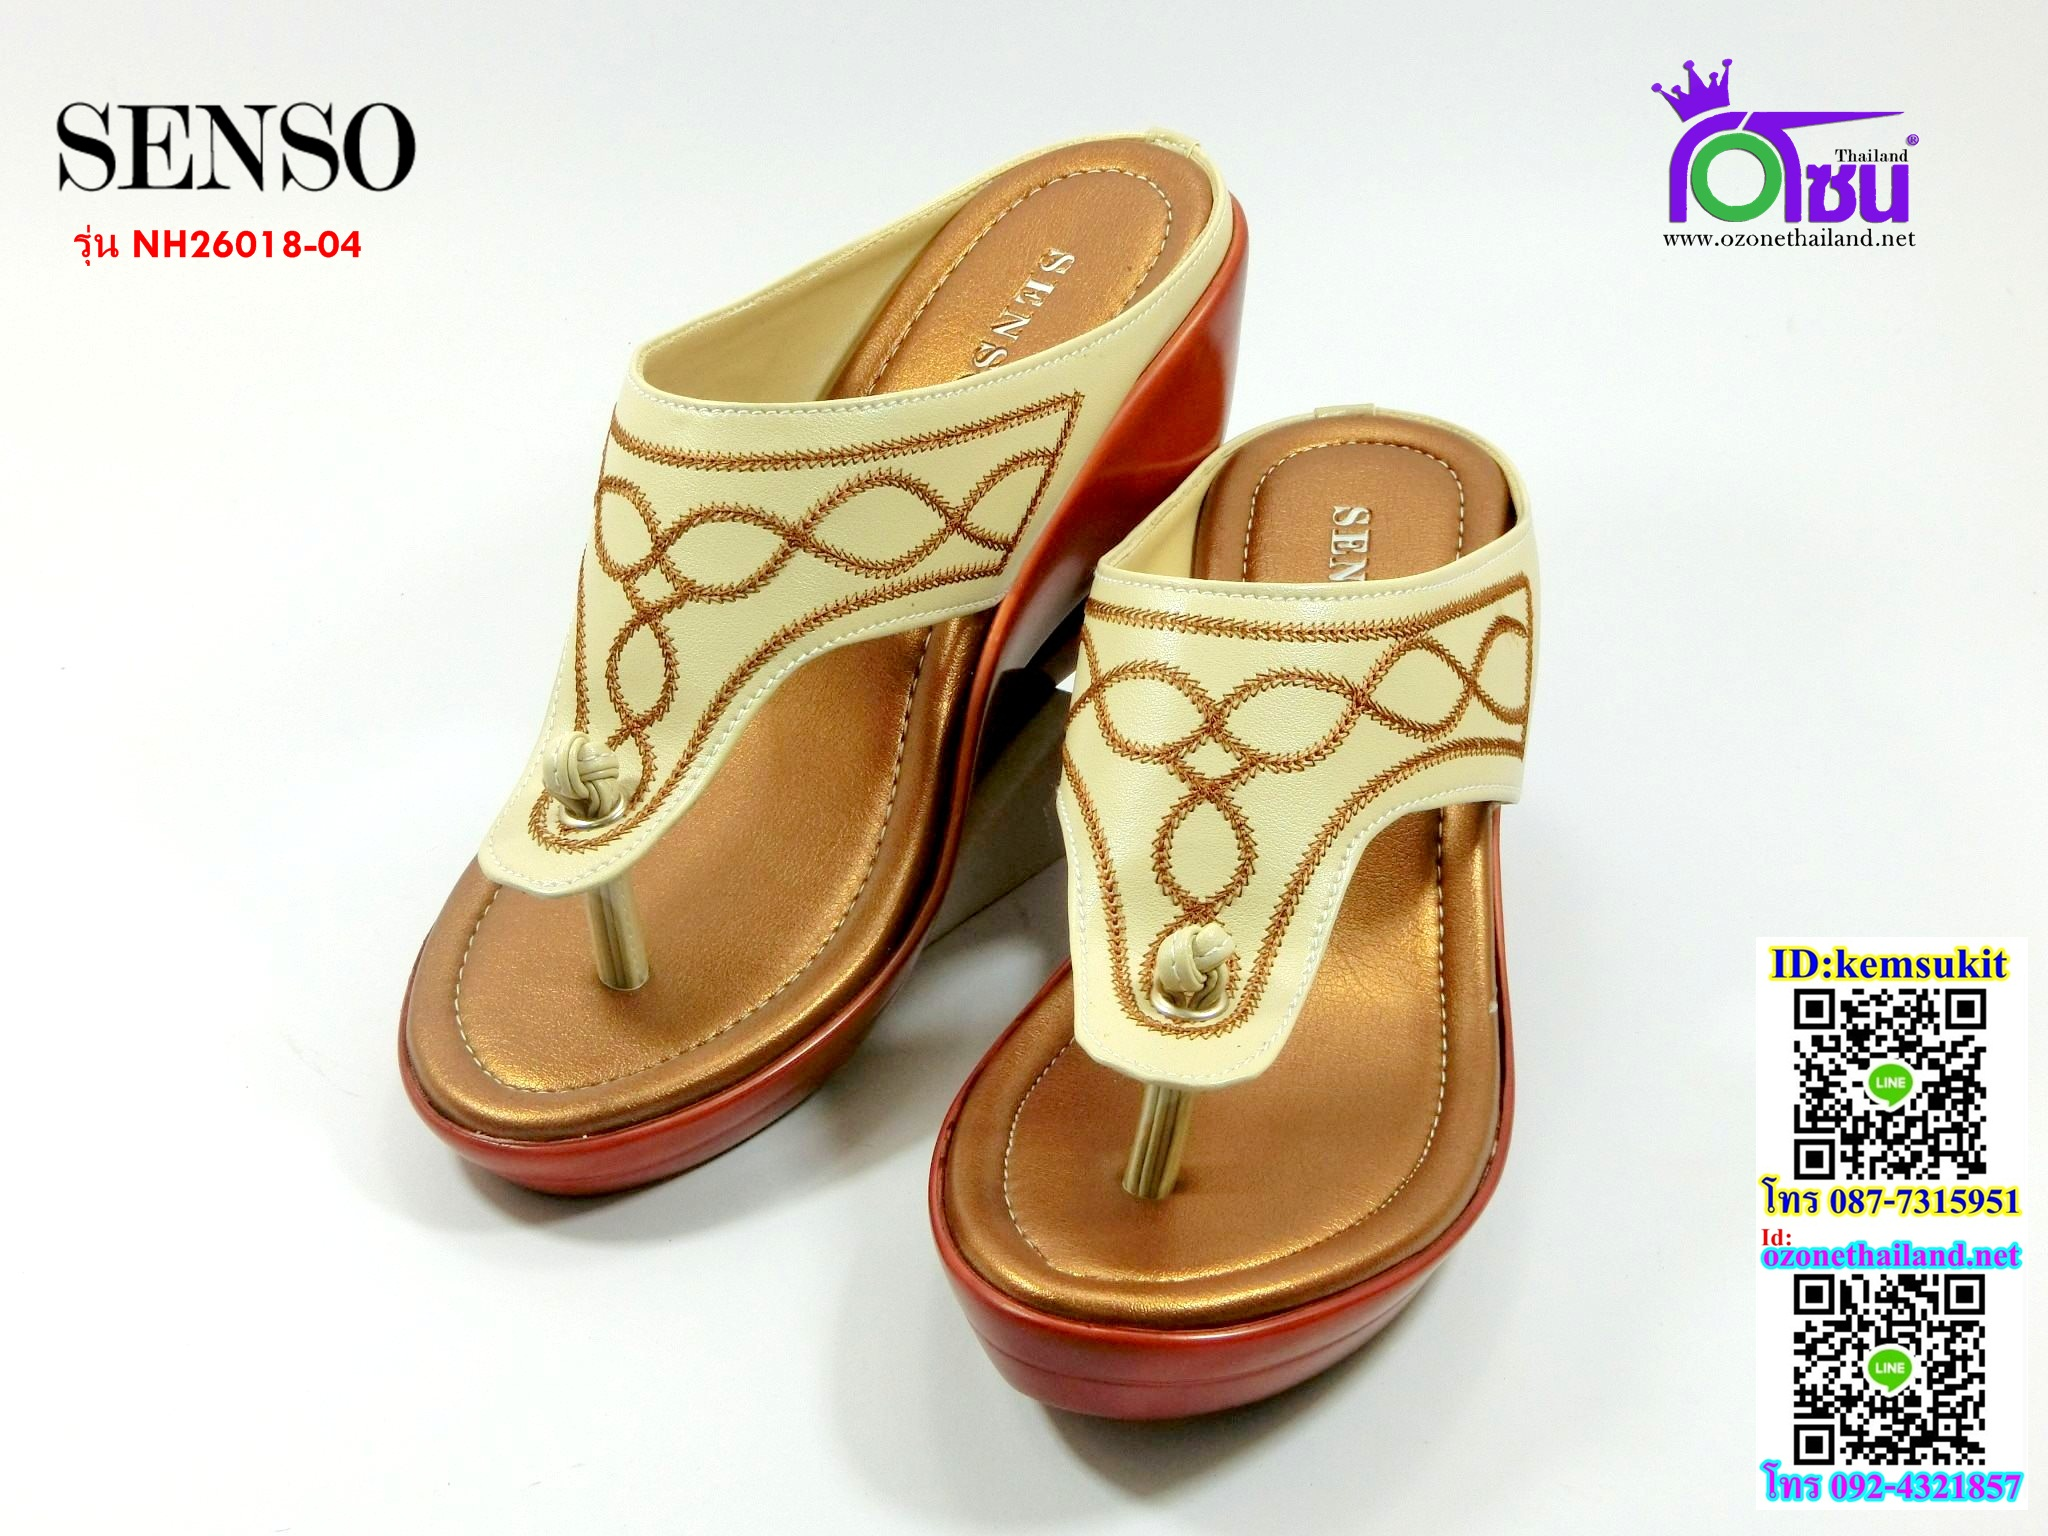 senso (เซนโซ) สีครีม รุ่นNJ26018-04 เบอร์36-40